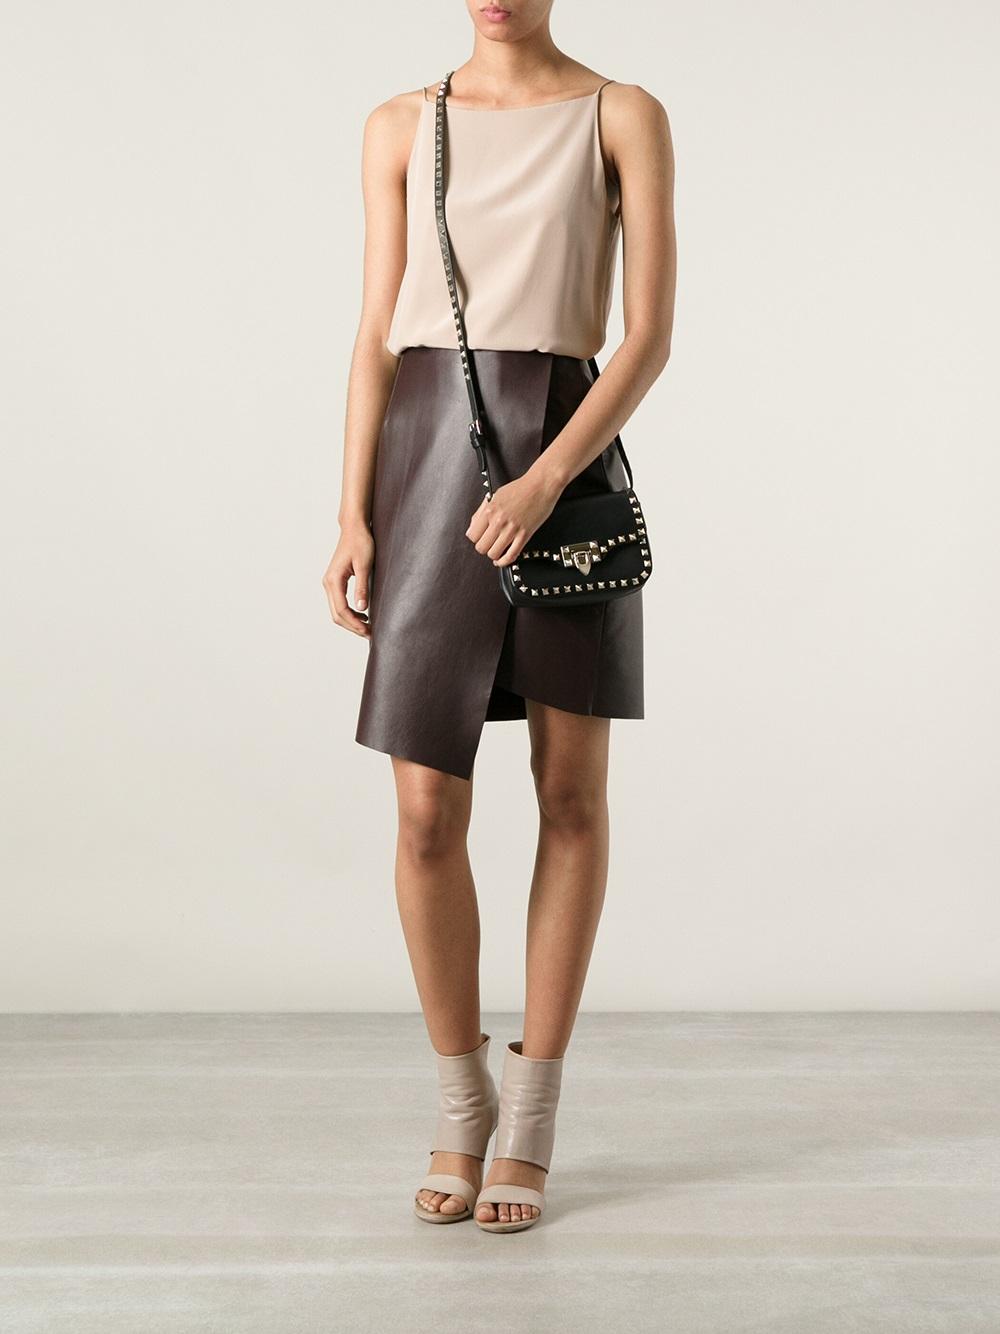 Valentino Rockstud Cross Body Bag In Black Lyst